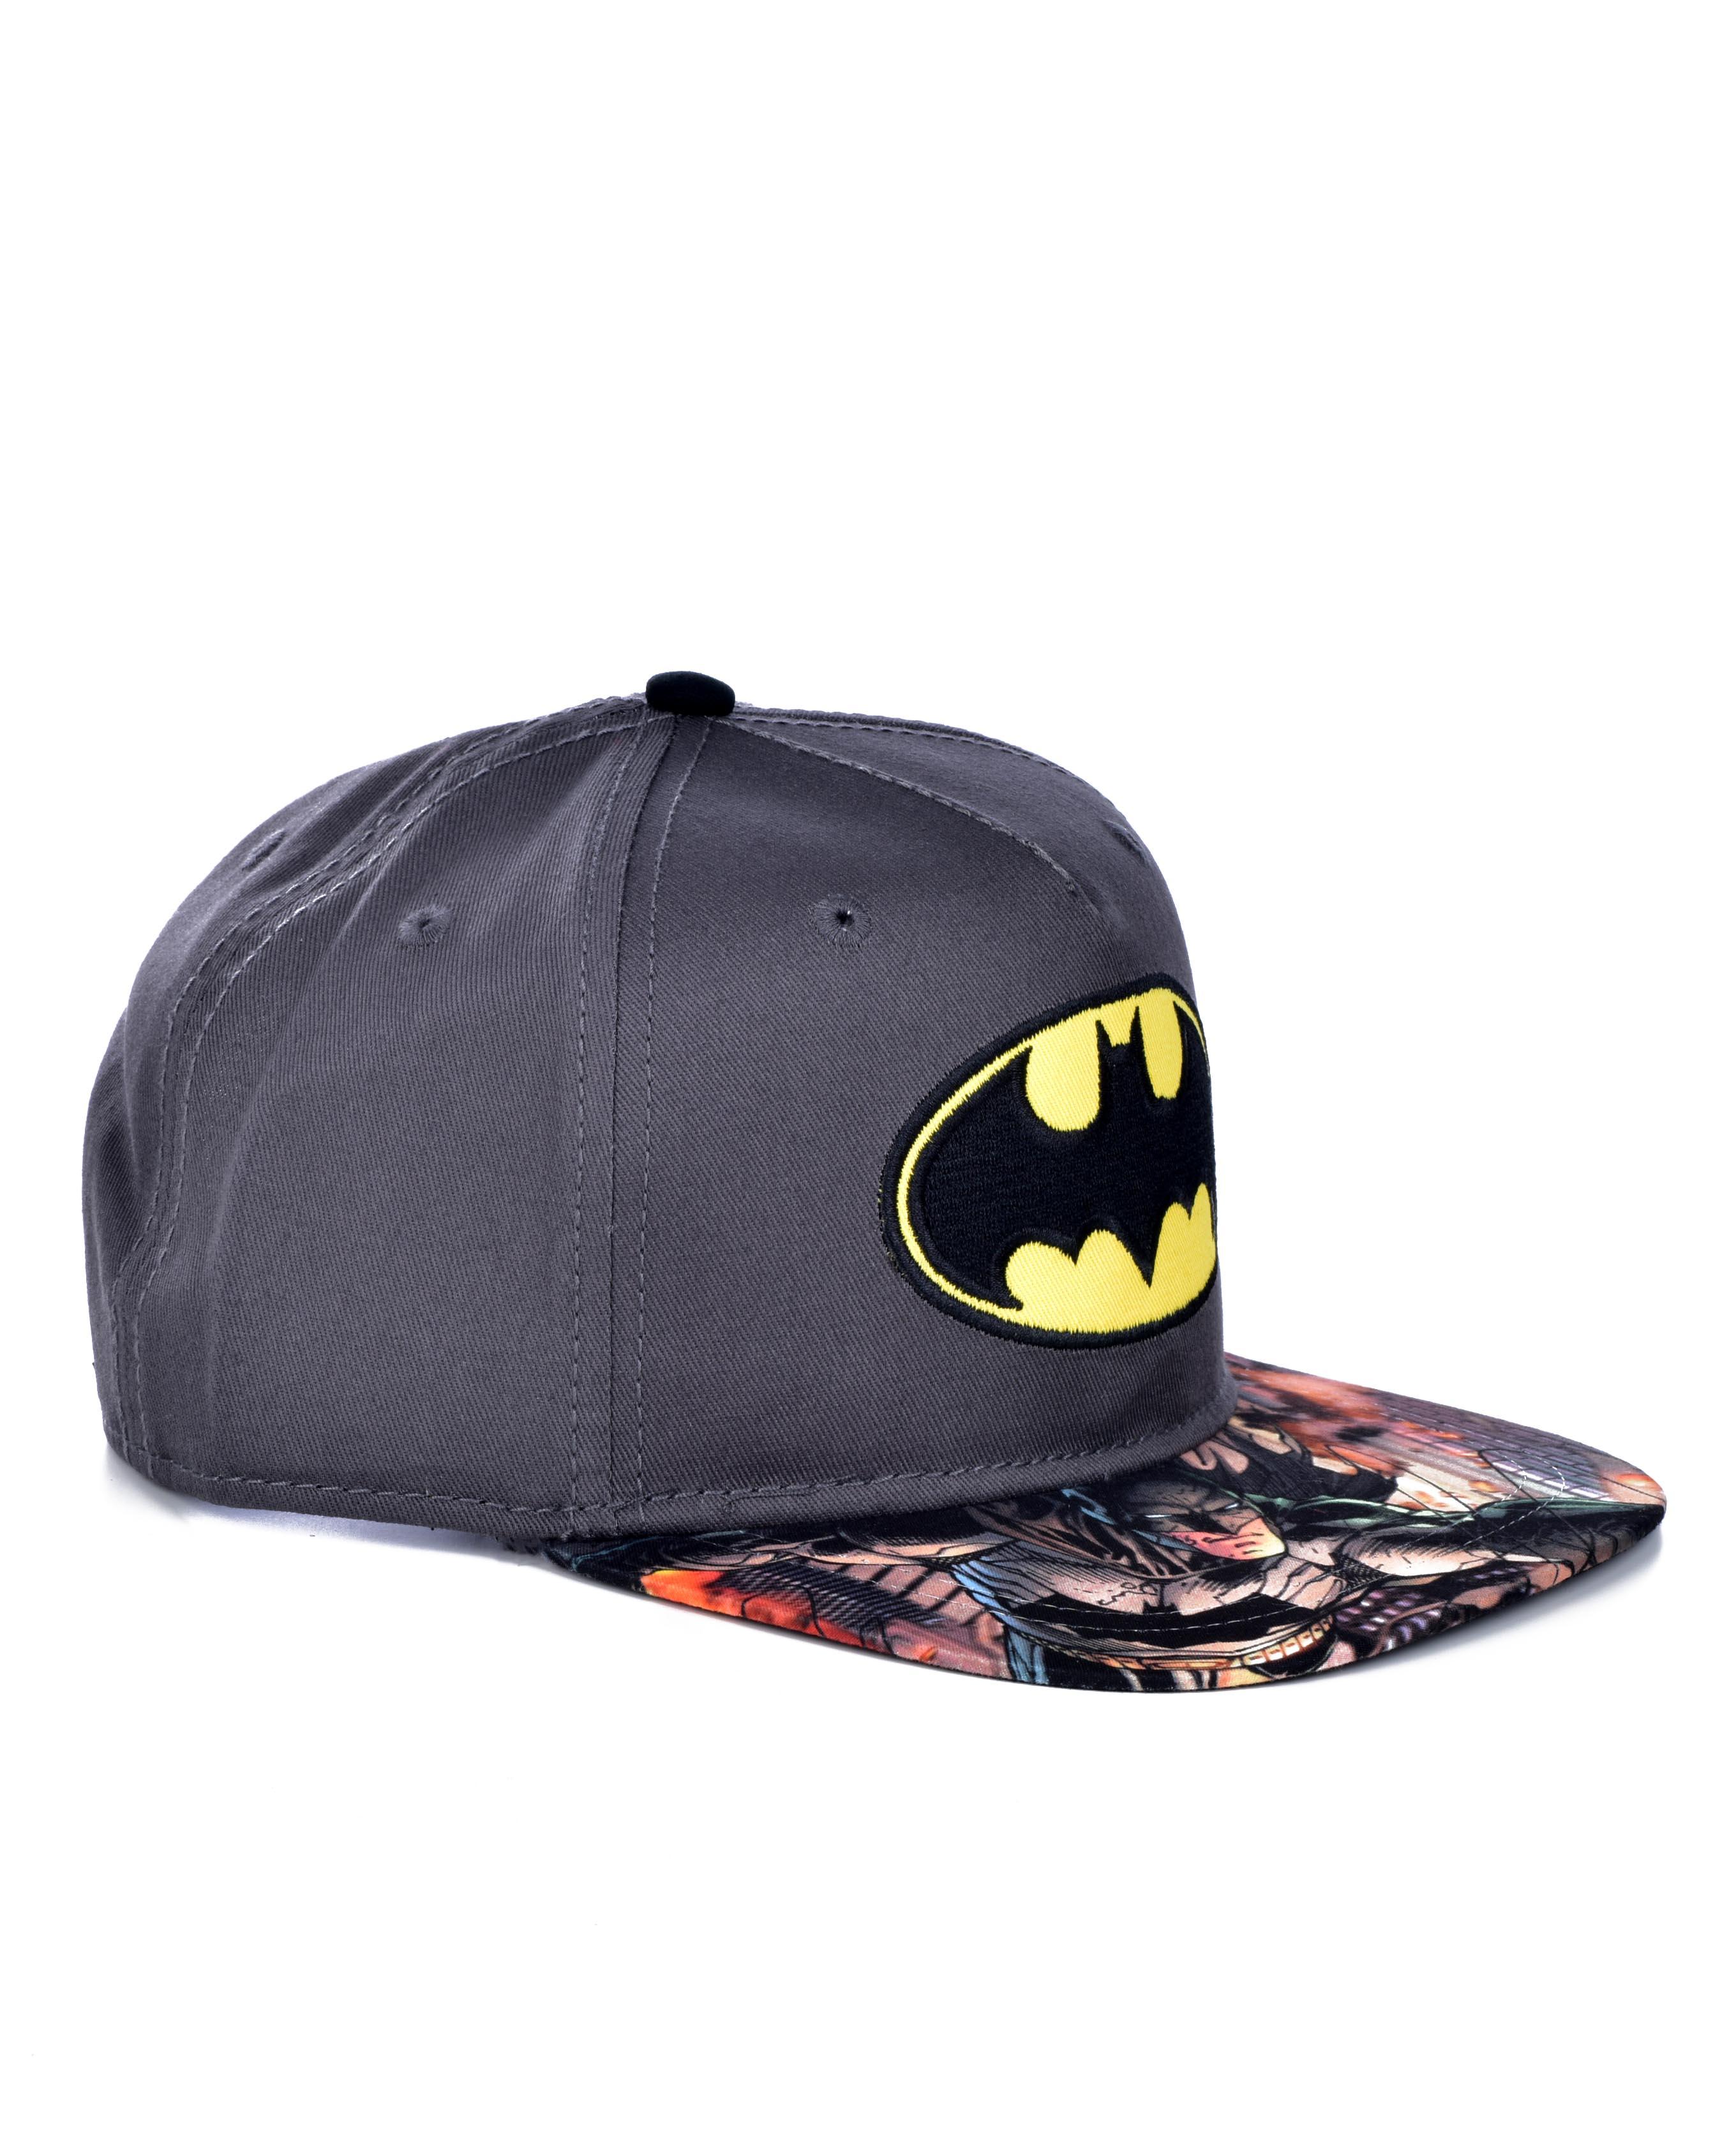 info for b8cea d7741 NEW-DC-Comics-Youth-Batman-Logo-Snap-back-